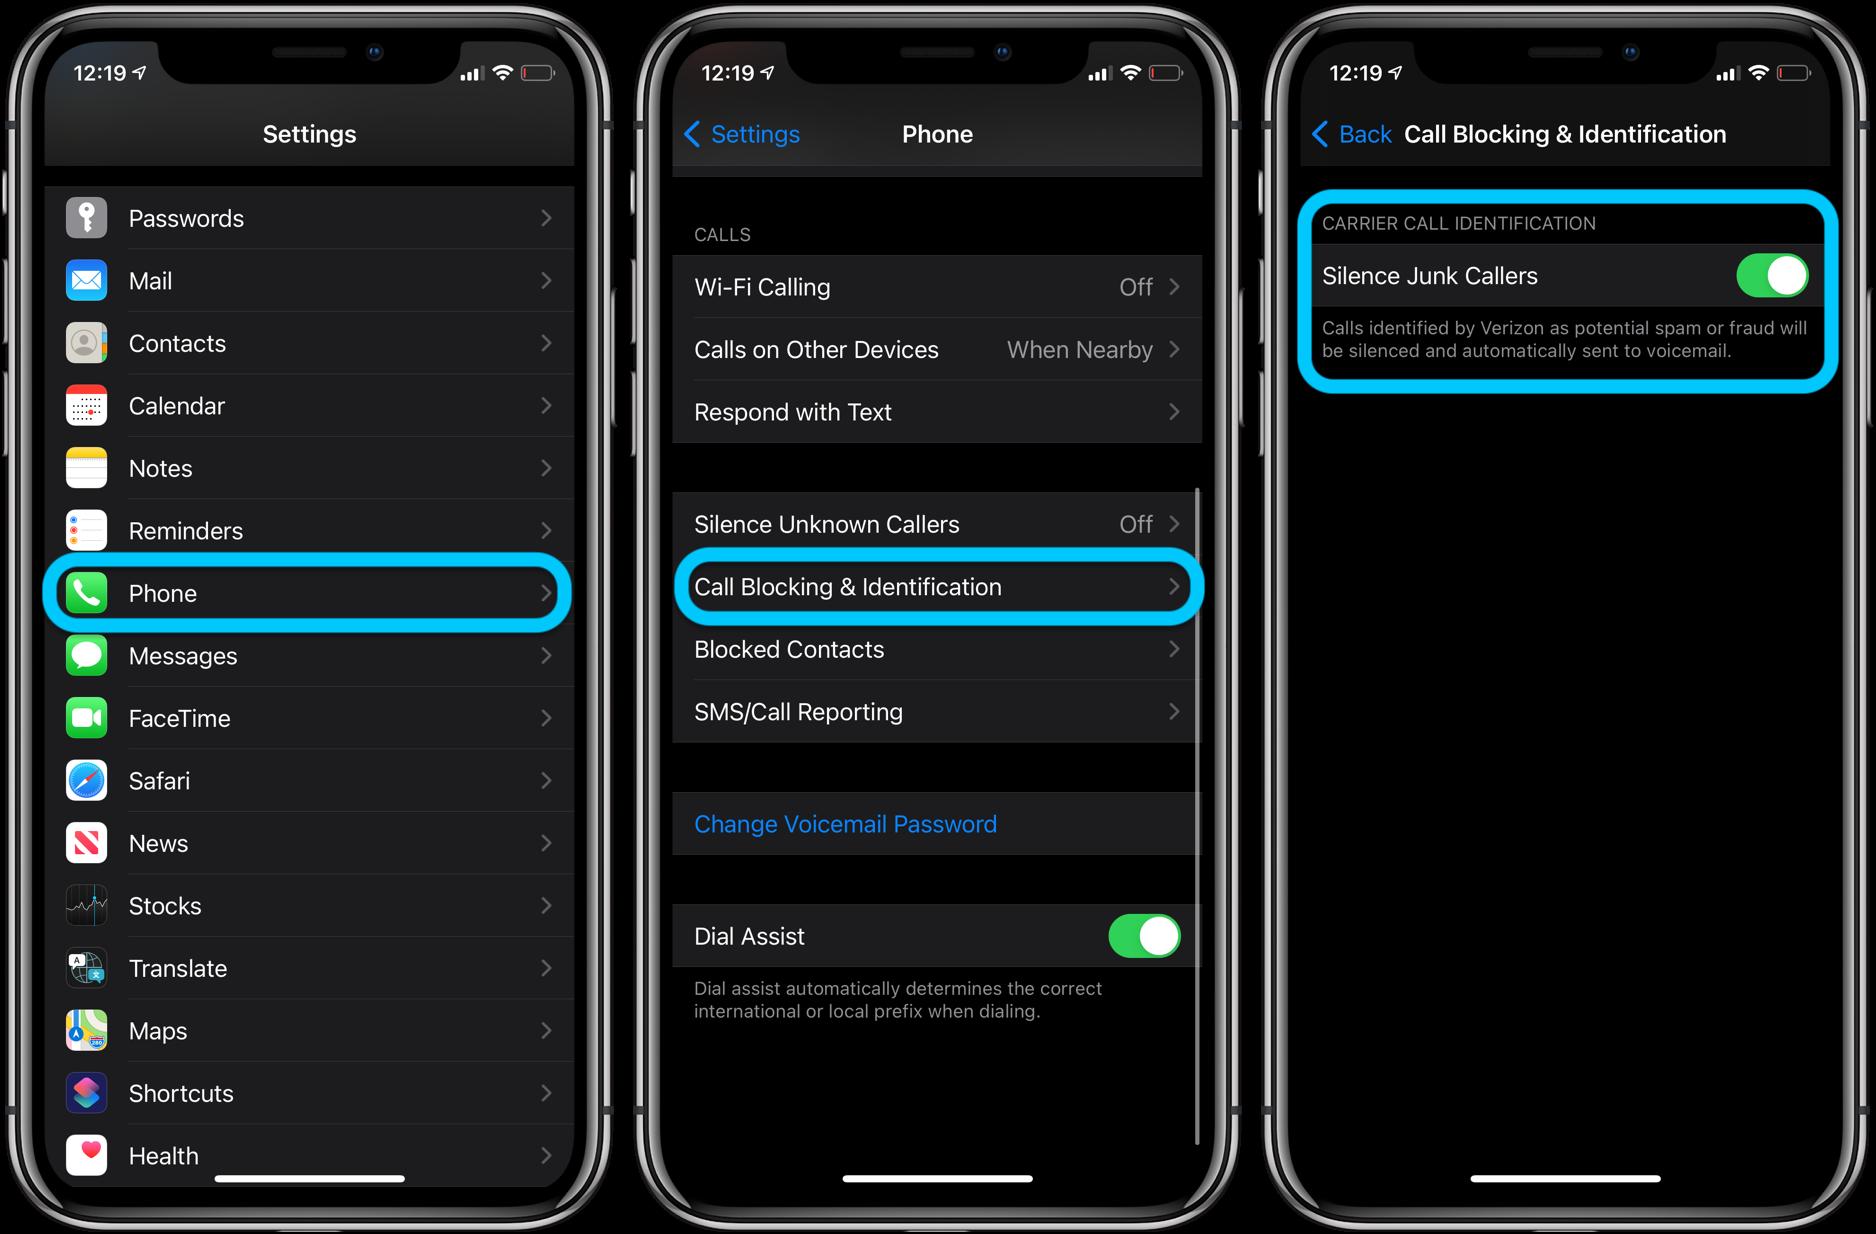 iPhone iOS 14 Verizon Silence Junk Callers